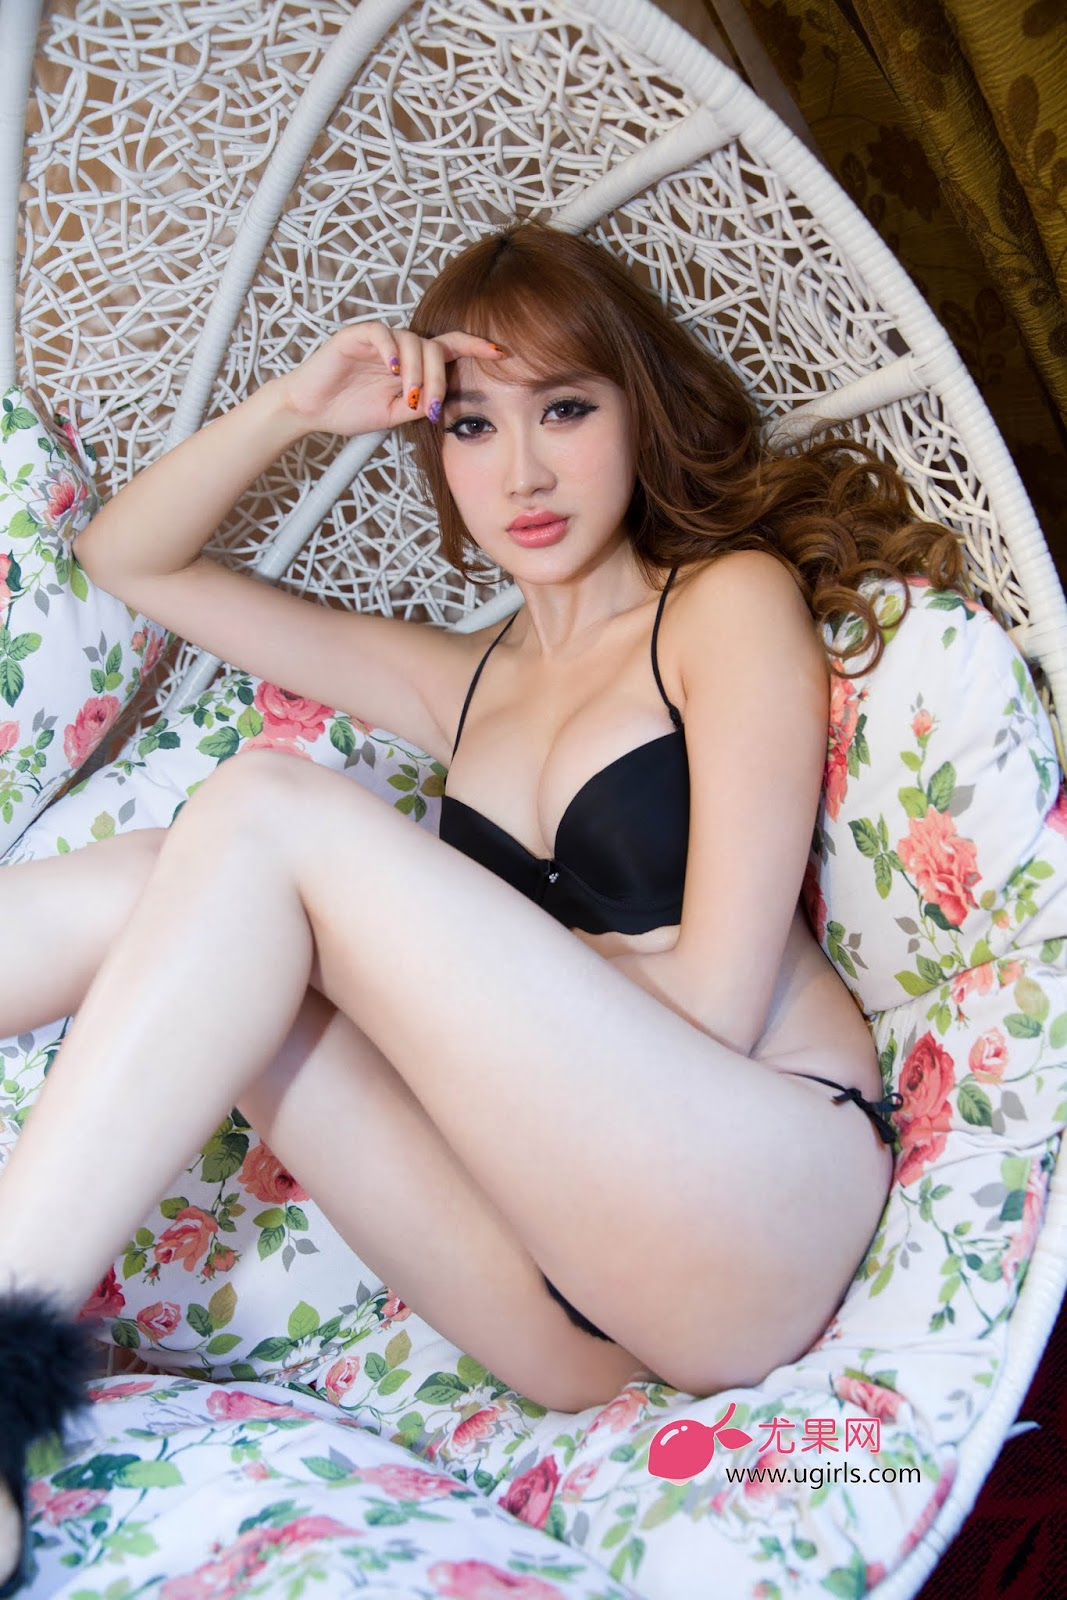 A14A4214 - Hot Photo UGIRLS NO.3 Nude Girl